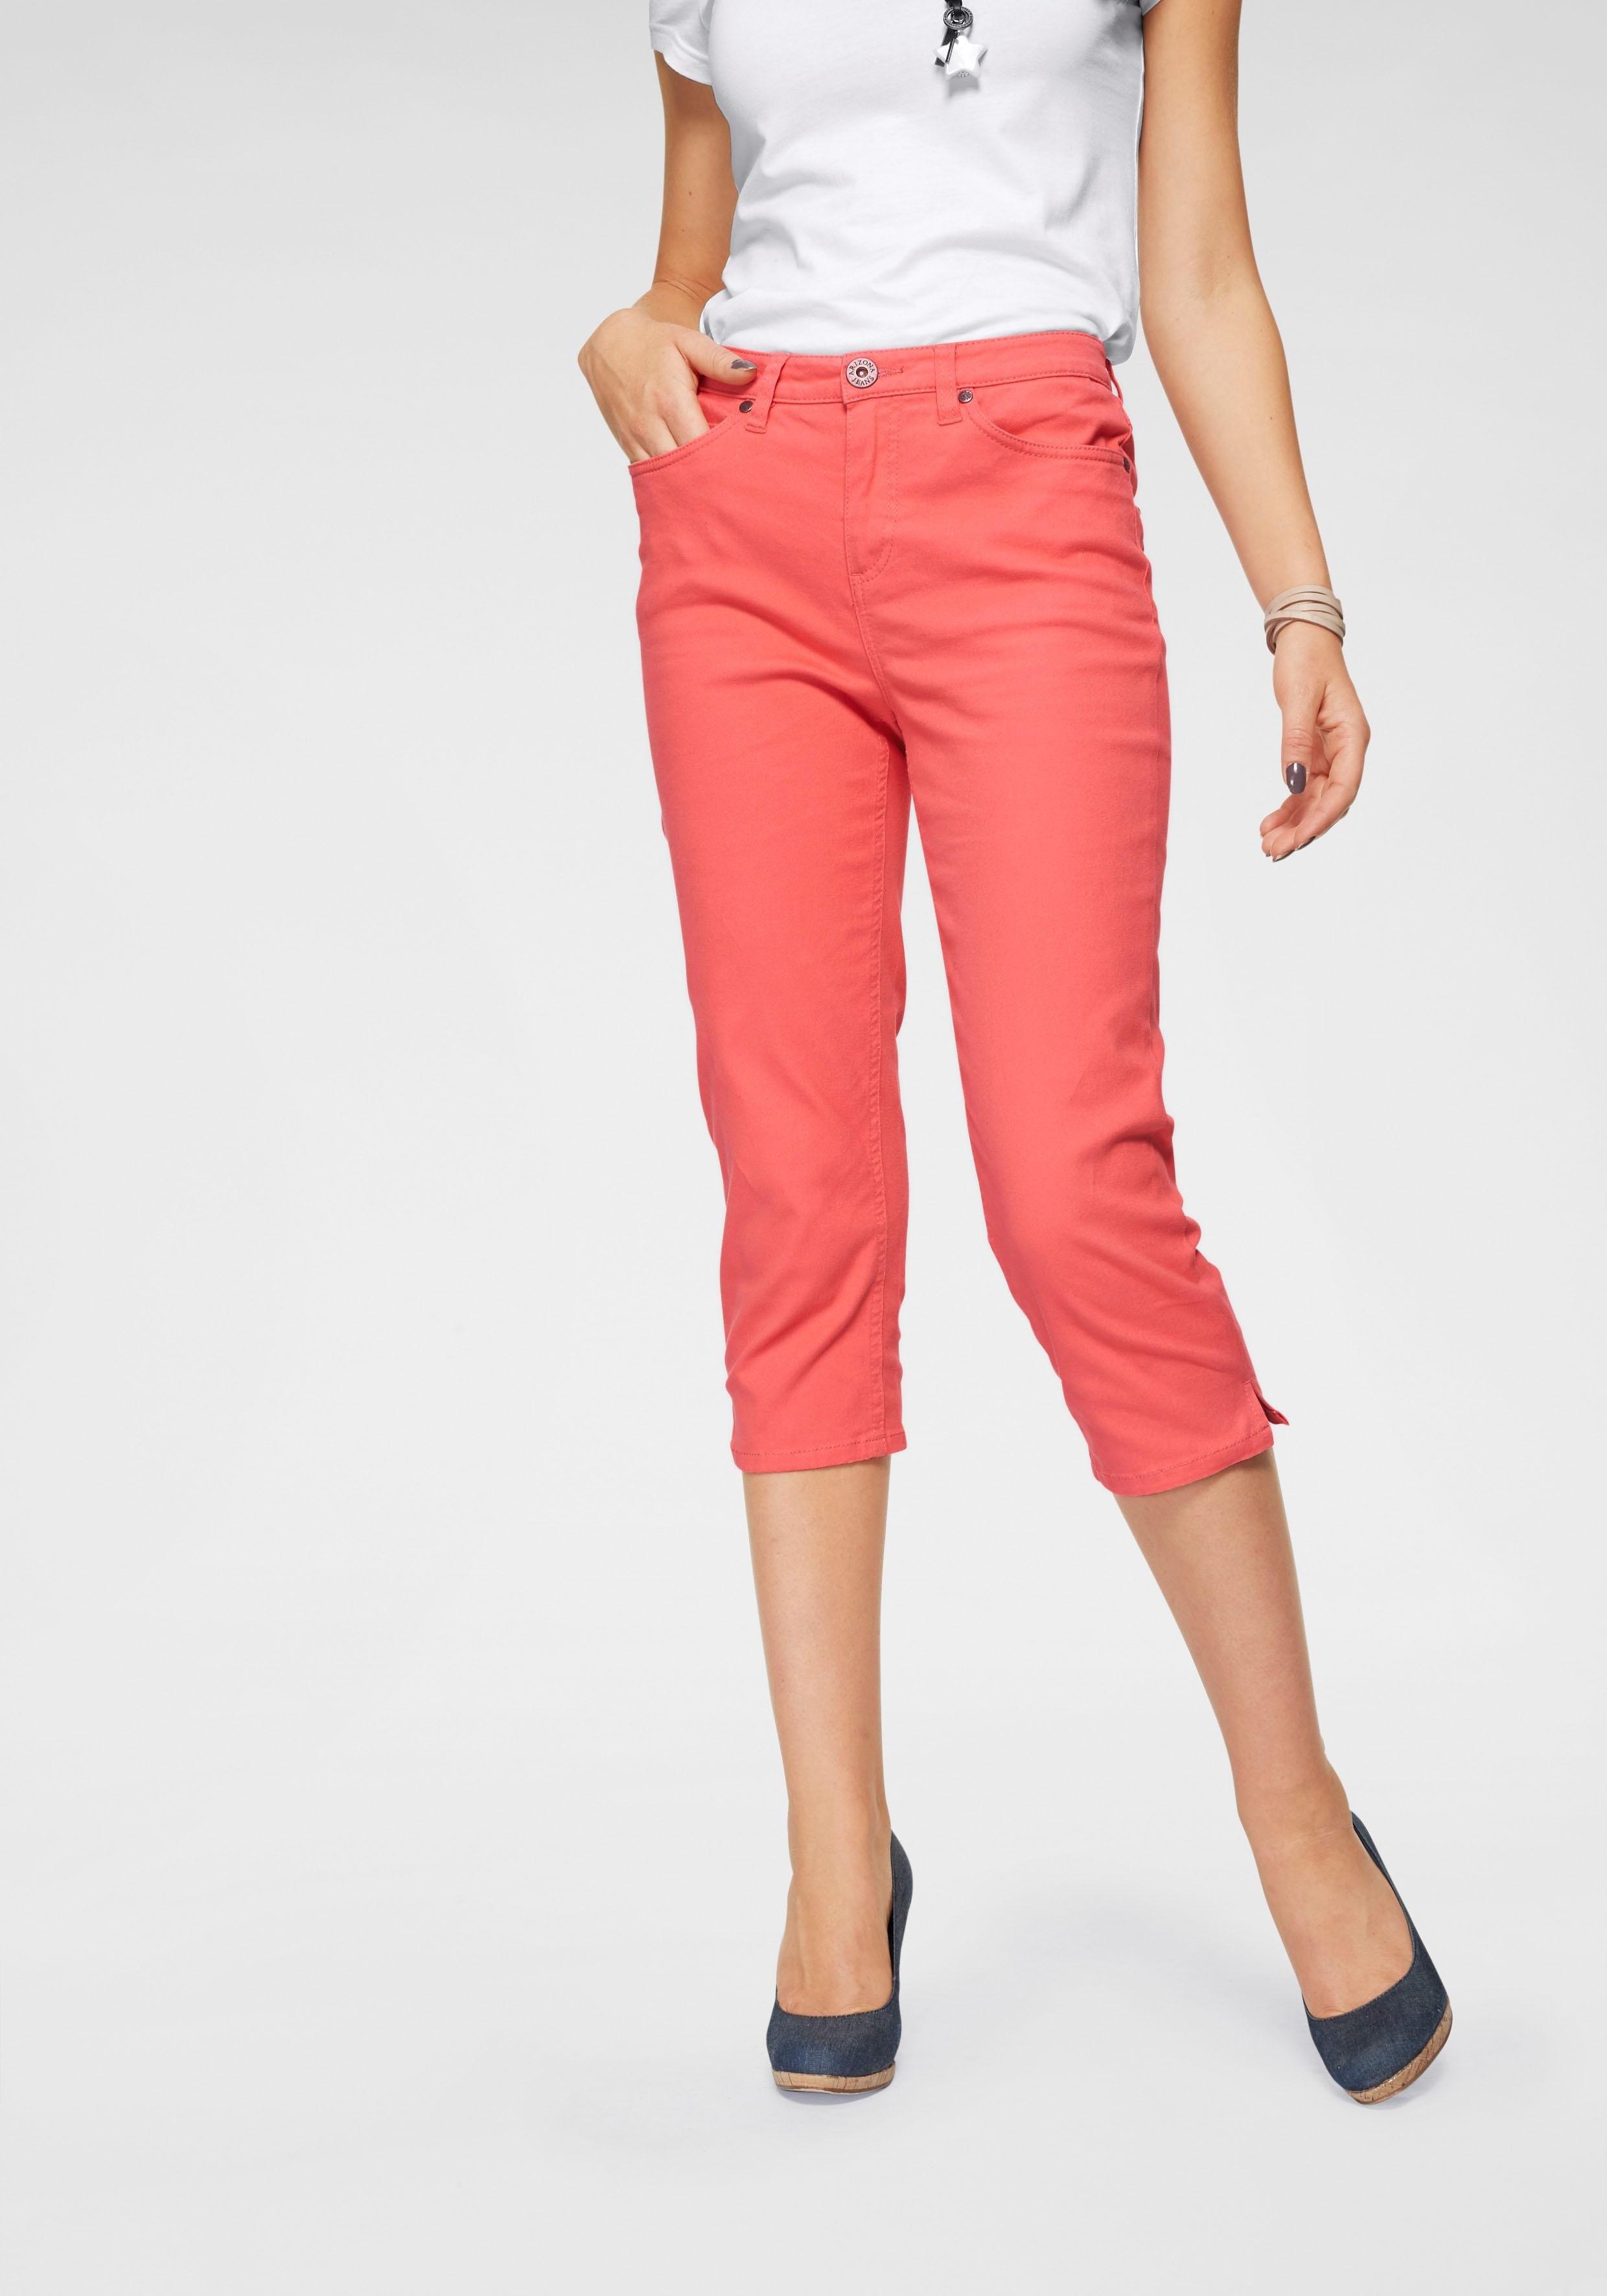 Shoppen jeanscomfort Online Arizona fit Capri 8NPkn0wOX